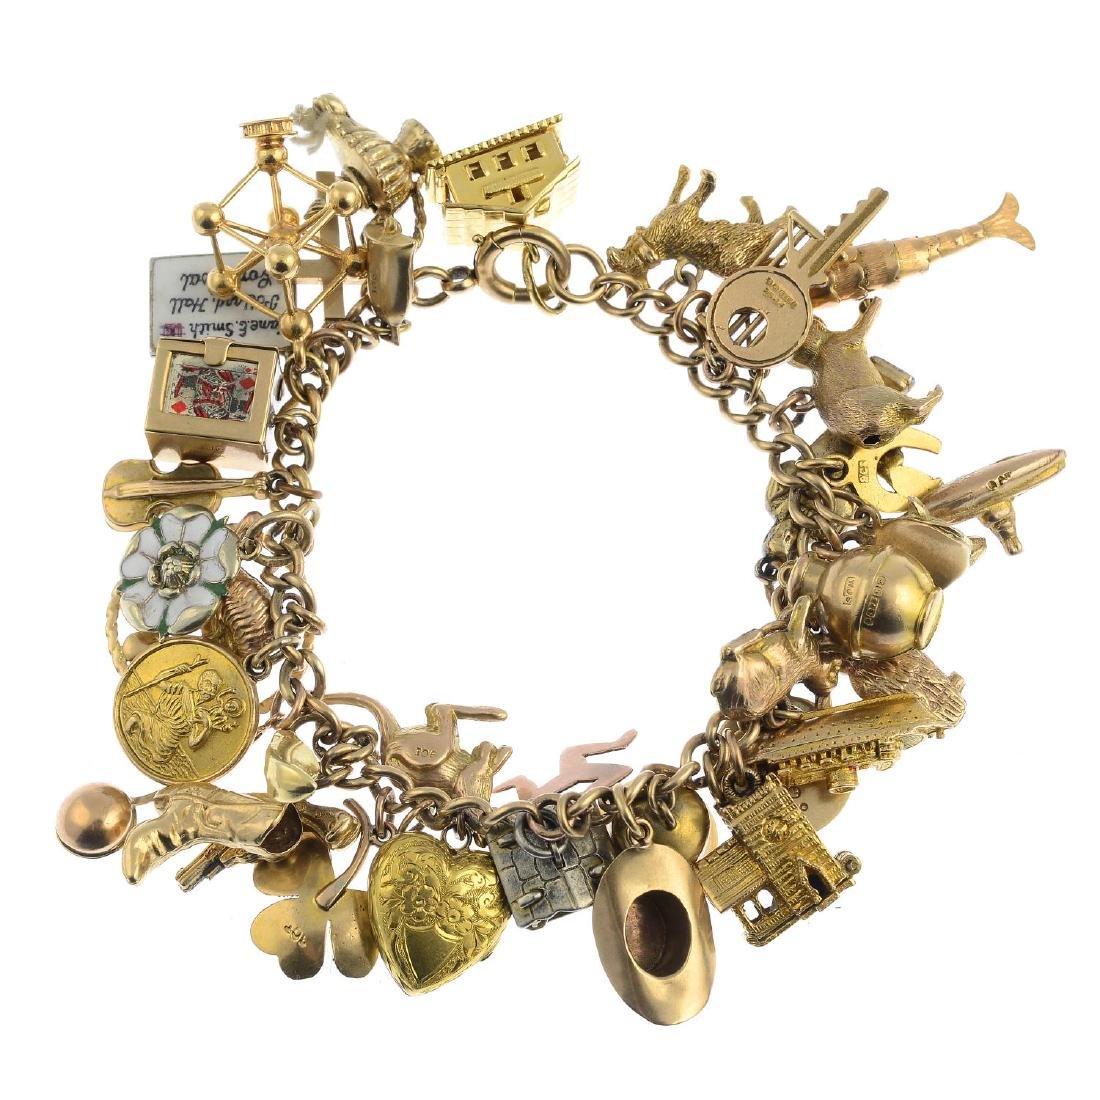 A charm bracelet. The curb-link chain, suspending a